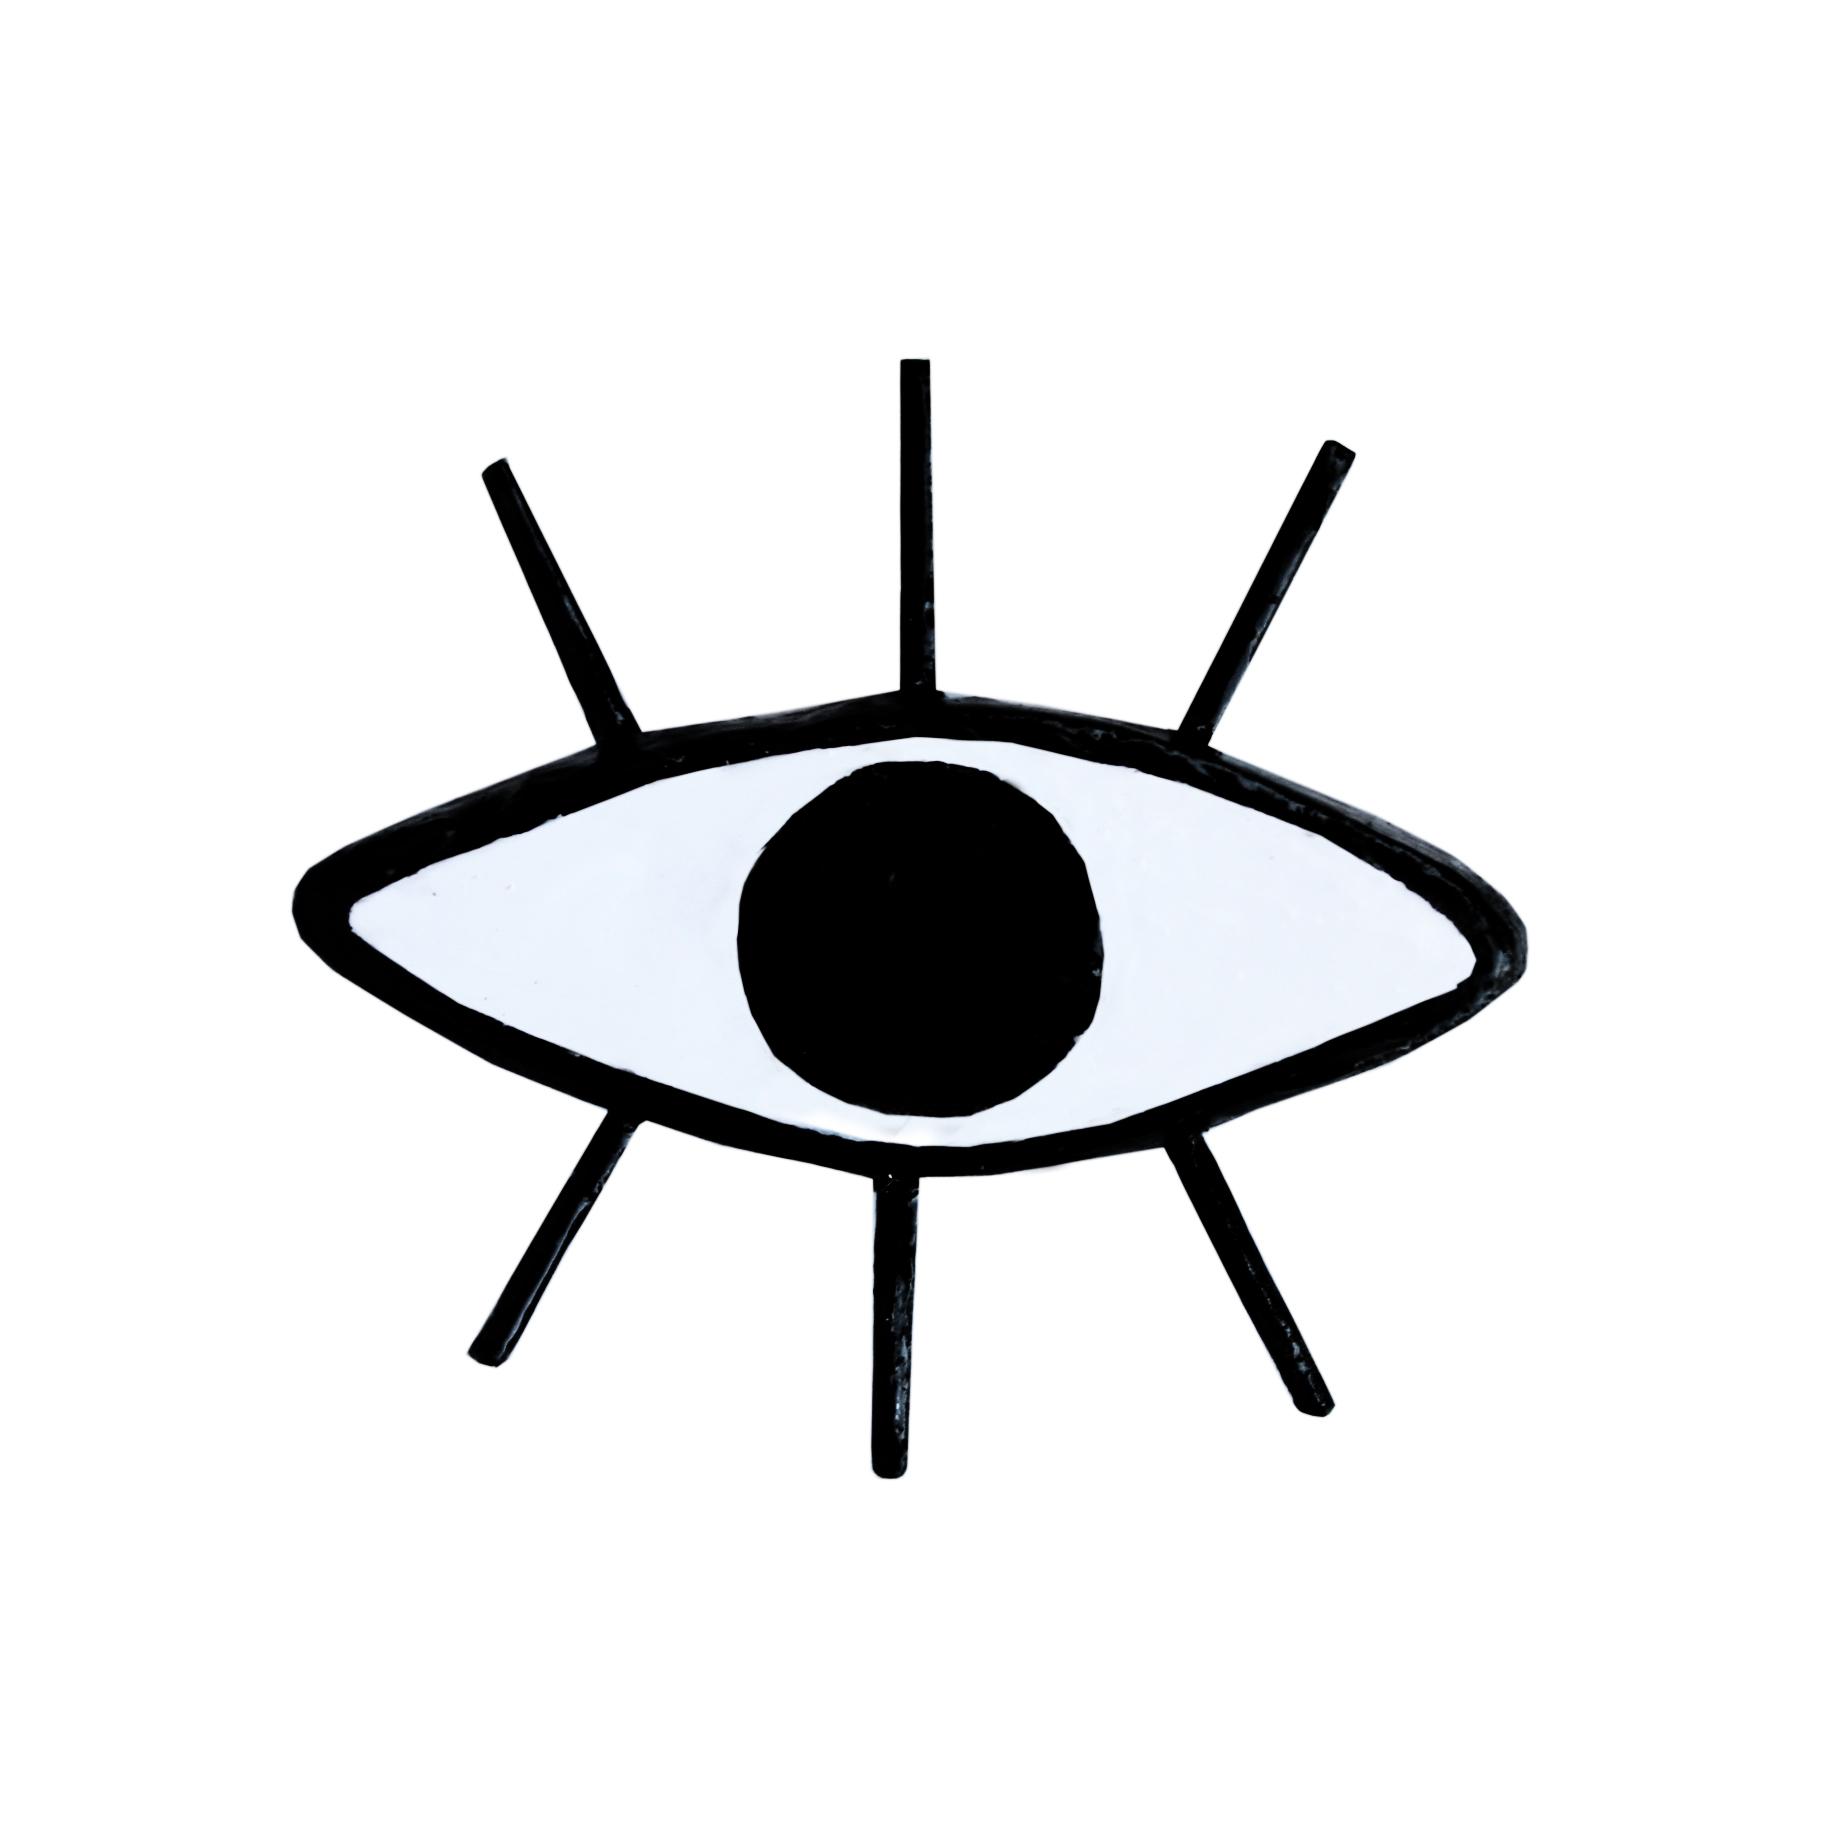 1848x1848 Style Evil Eye Pin Brooch Black